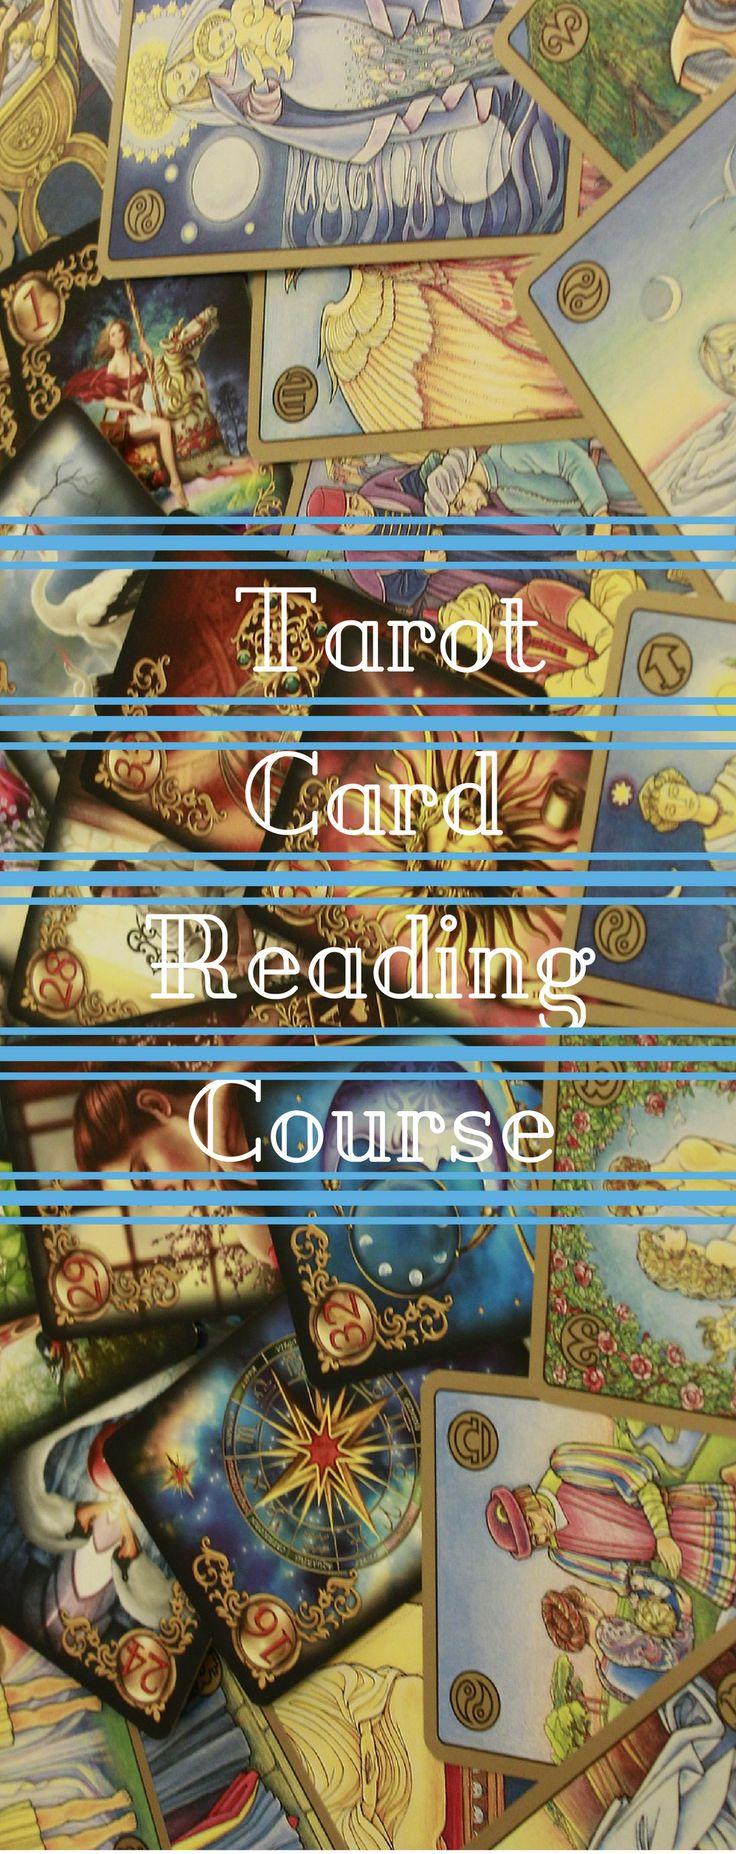 Complete tarot card reading course reading tarot cards